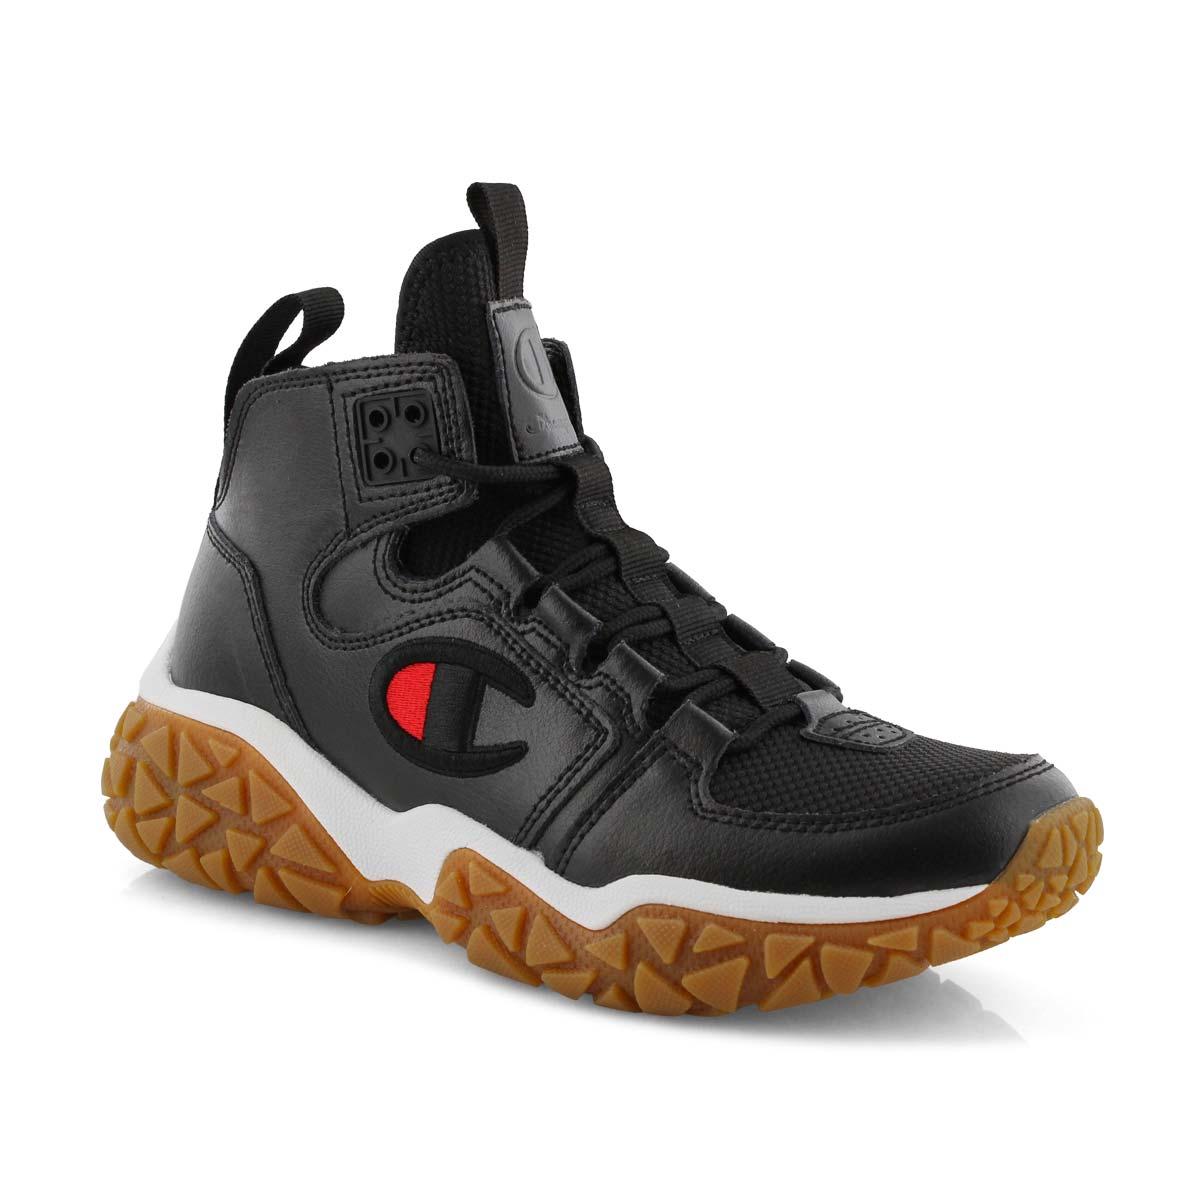 Kds Tank Grid black lace up sneaker